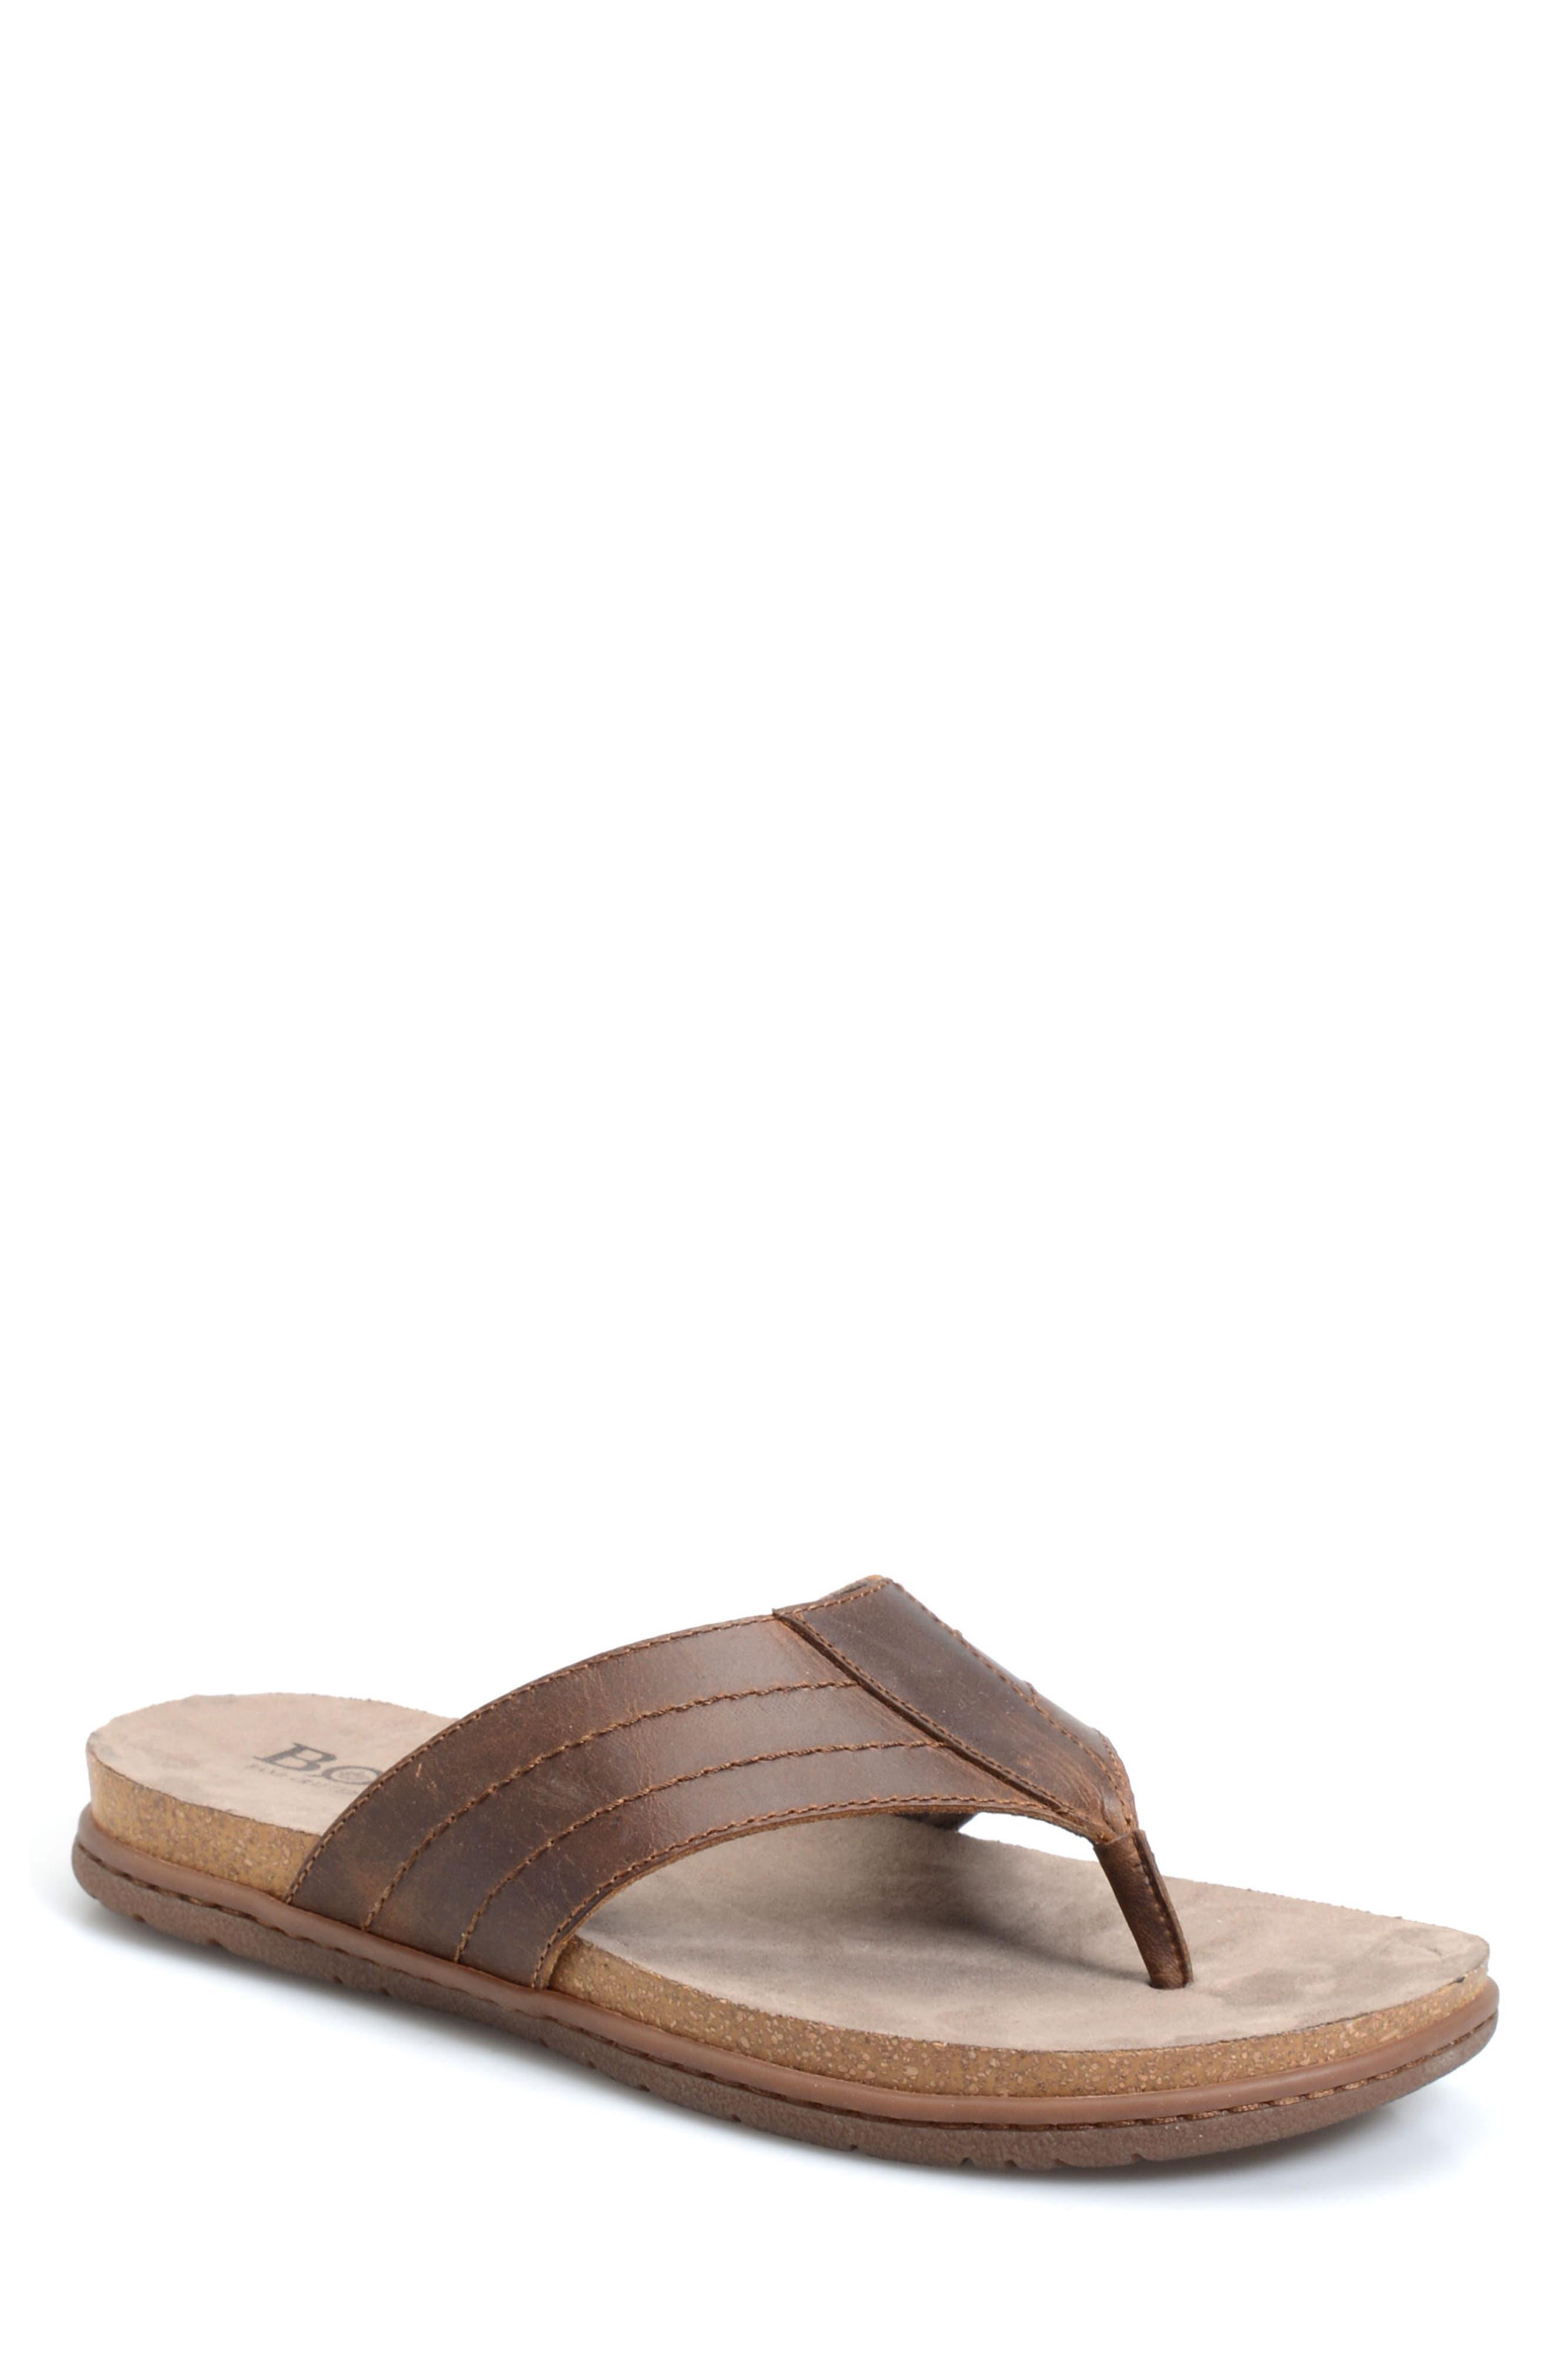 Palu Flip Flop,                         Main,                         color, Dark Brown